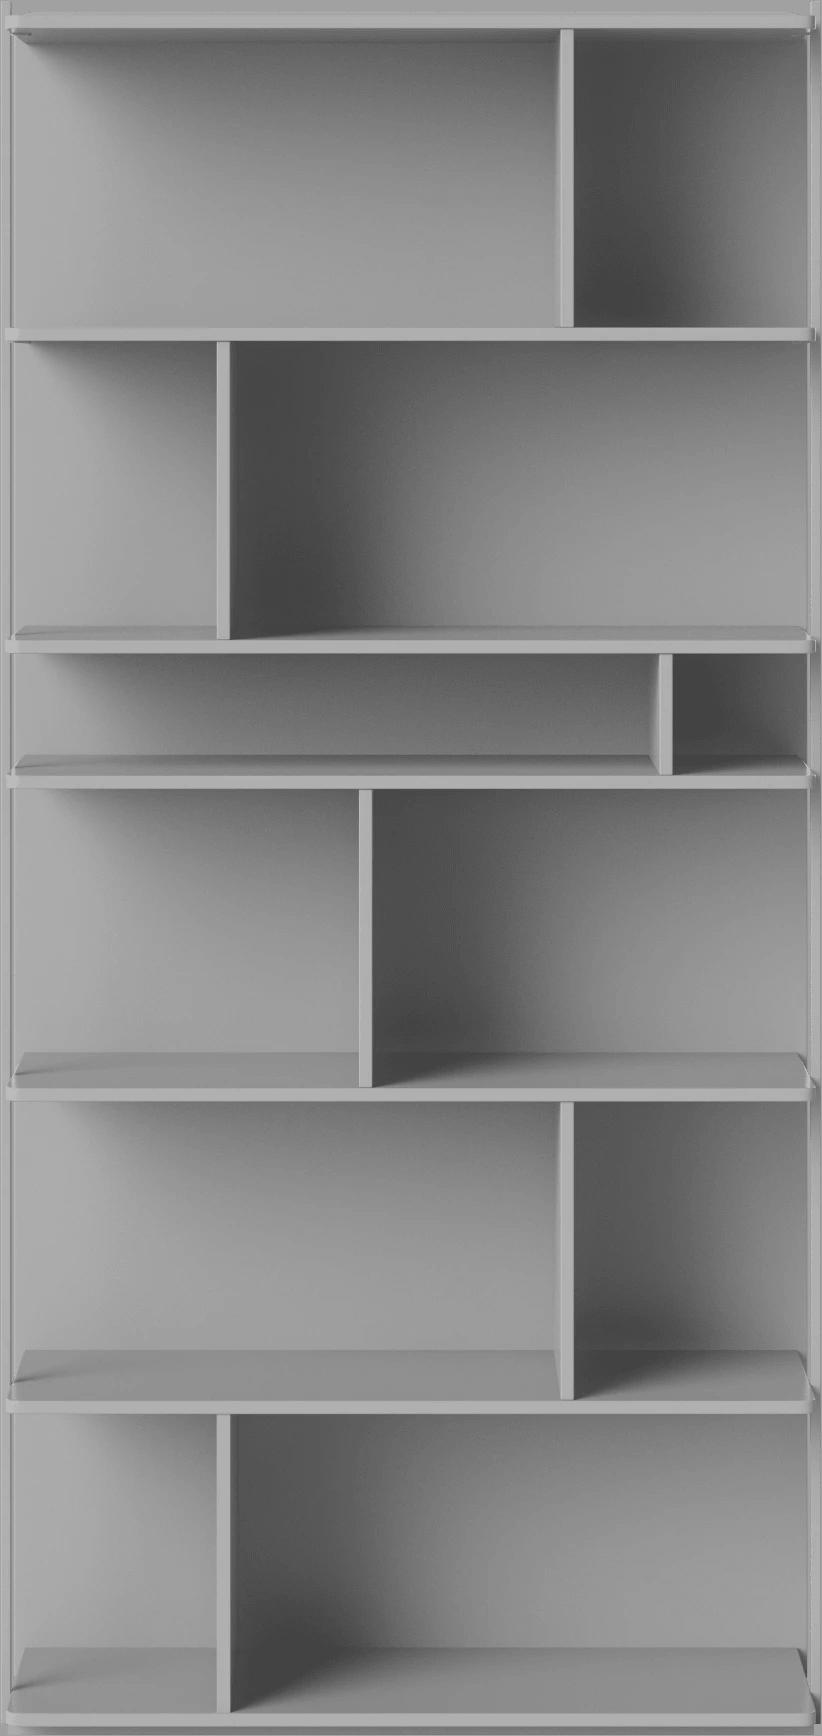 bolia_structure_rack_low_polc_polcrendszer_living_room_furniture_nappali_butor_MDF_innoconcept_design_furniture_desing_butor_01